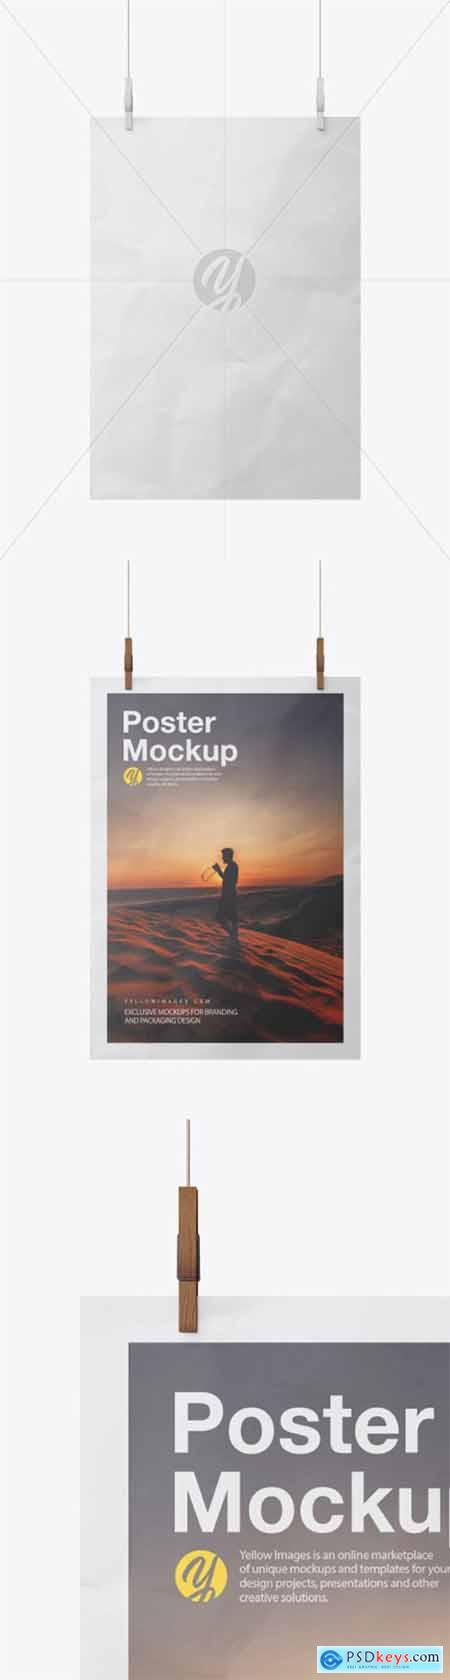 Crumpled A3 Poster Mockup 51958